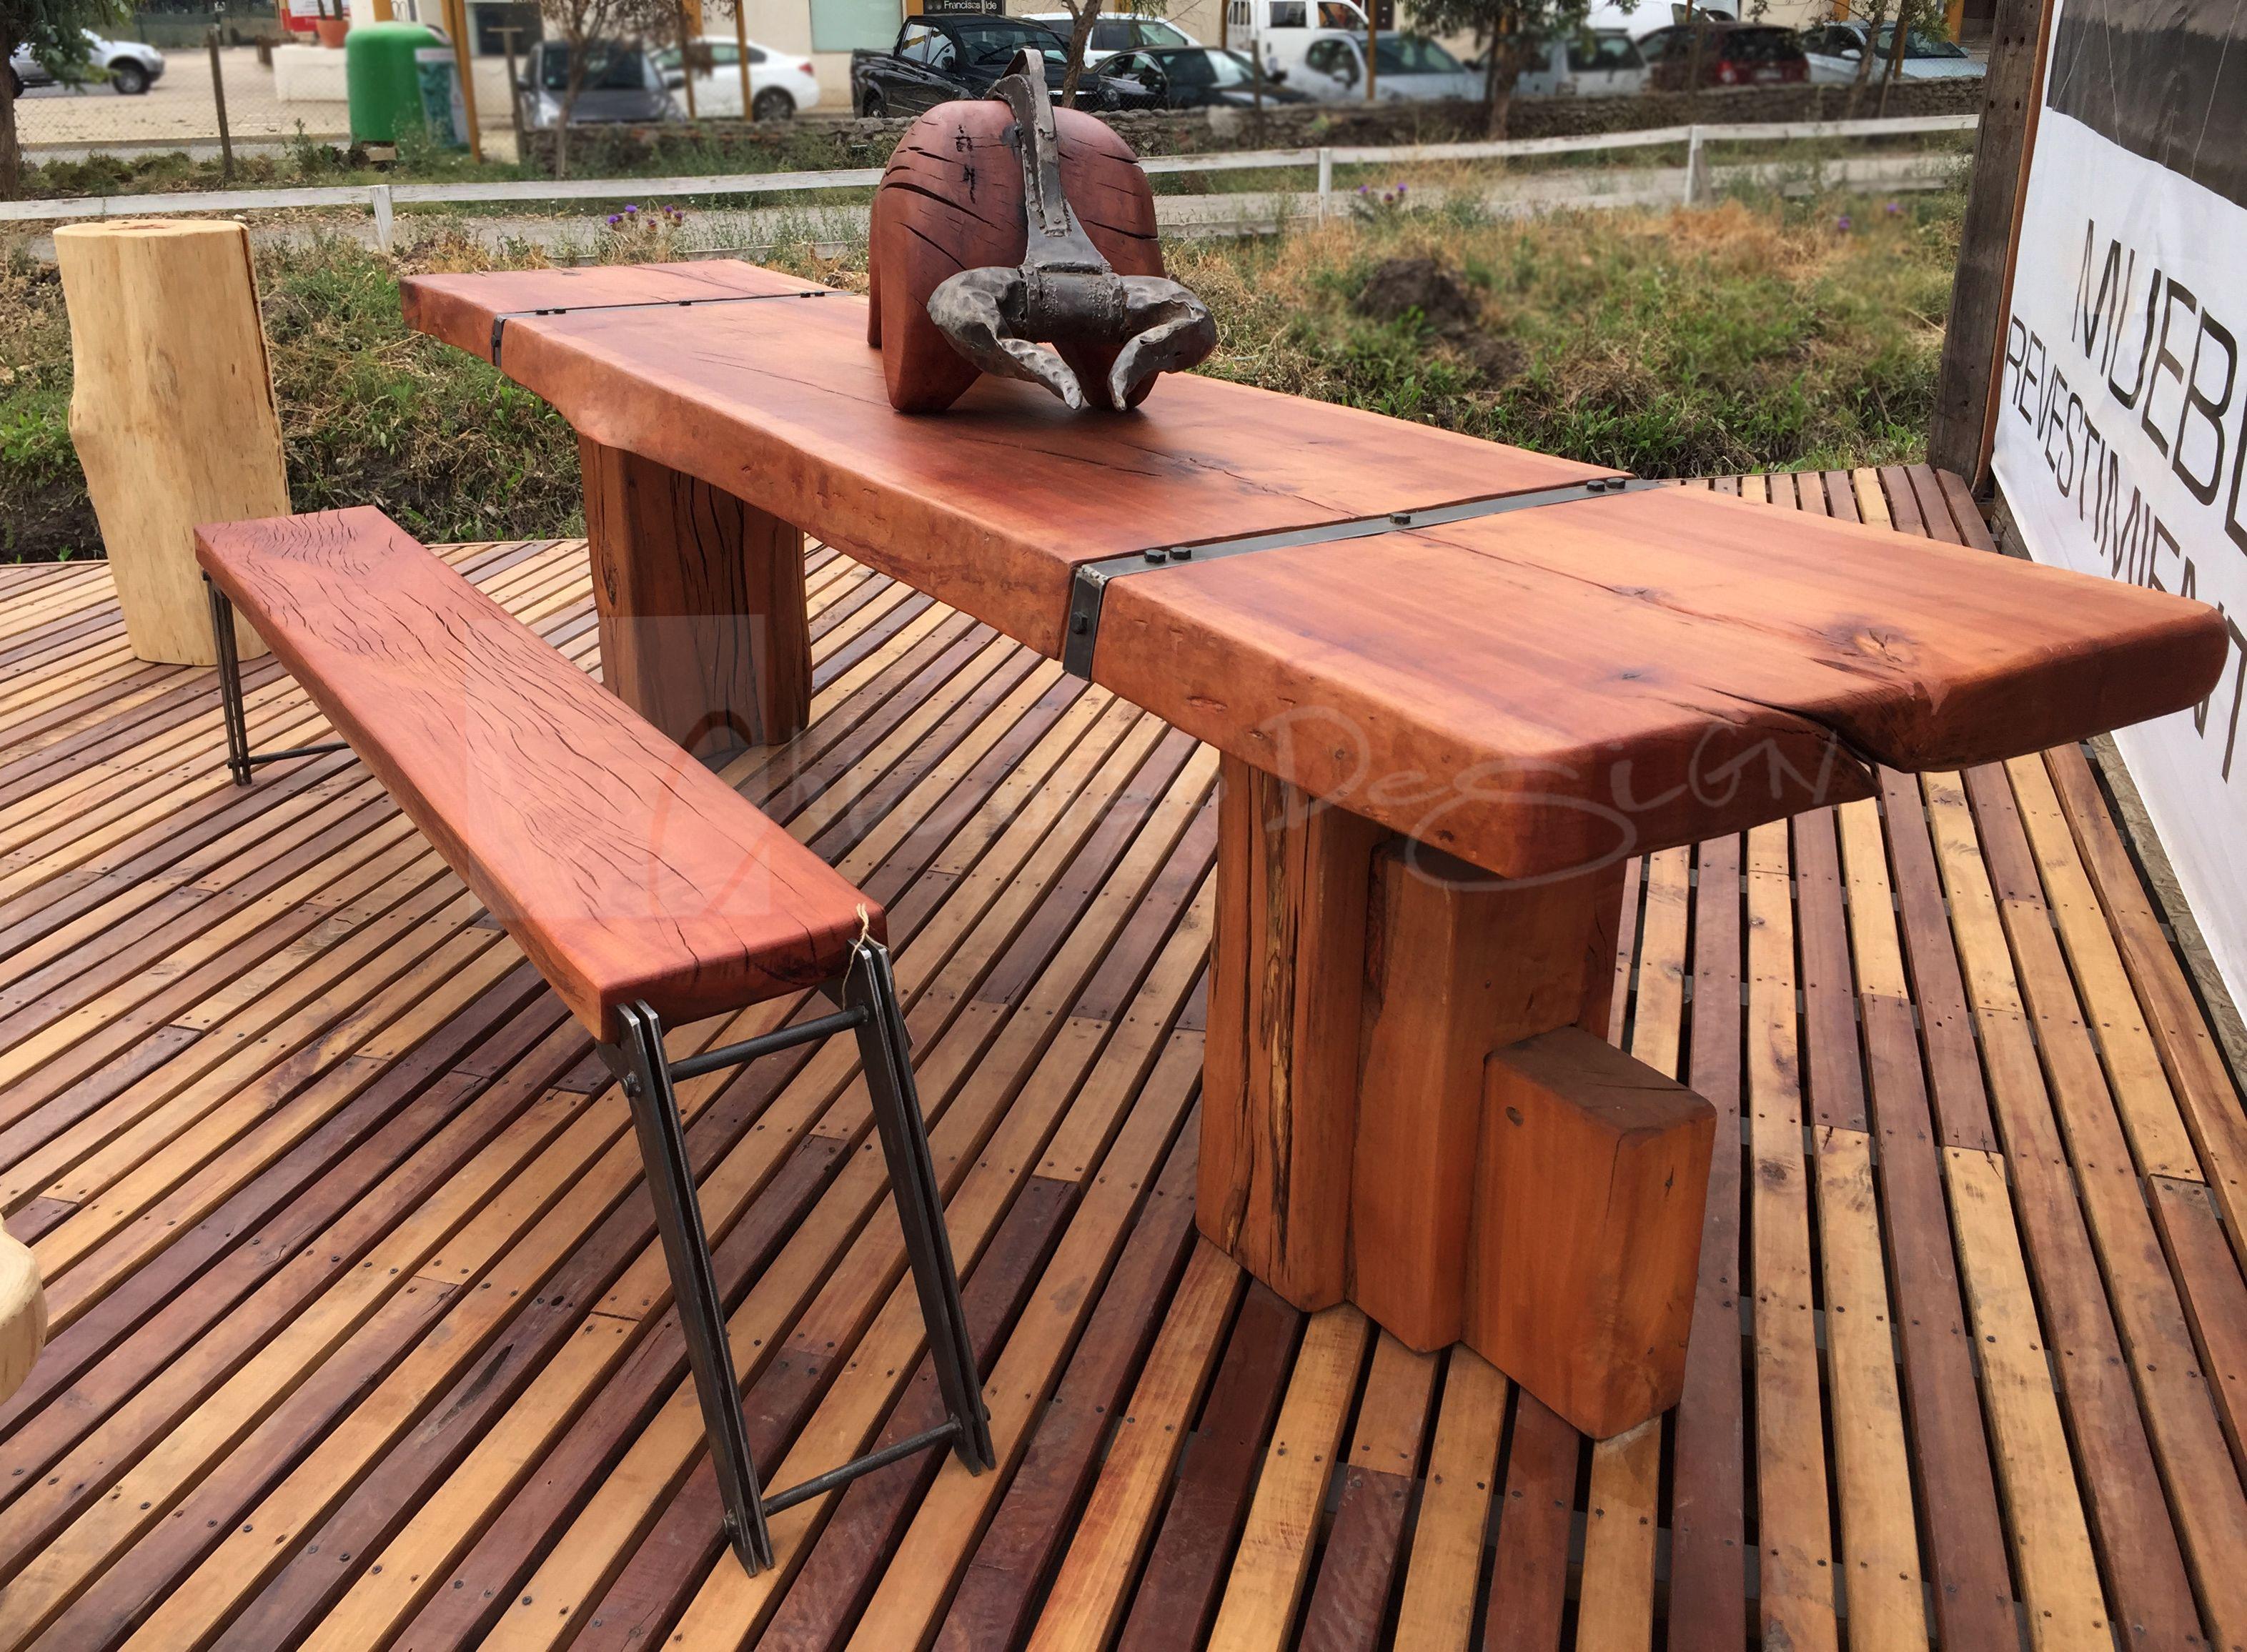 Chicureo design mes n quincho blockwood roble mes n de for Mesones de madera